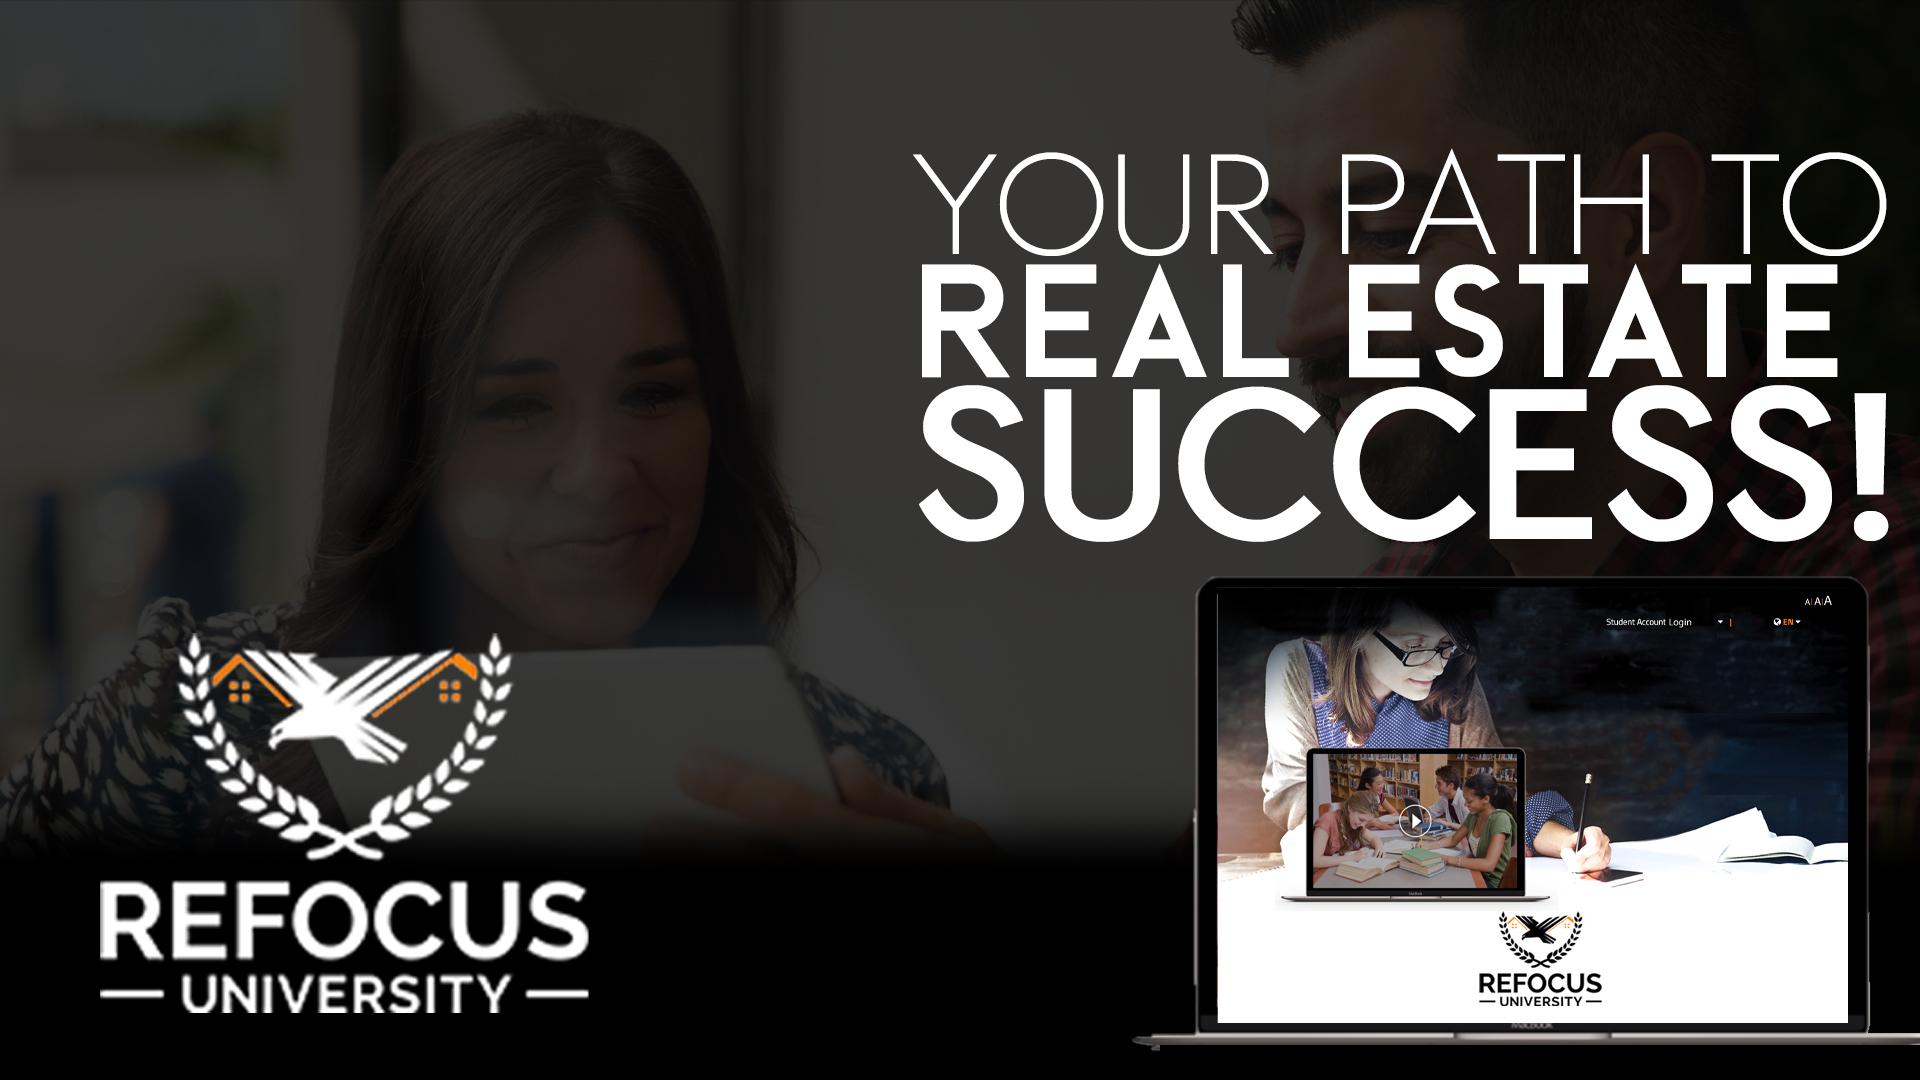 Refocus University Your path to Real Estate Success